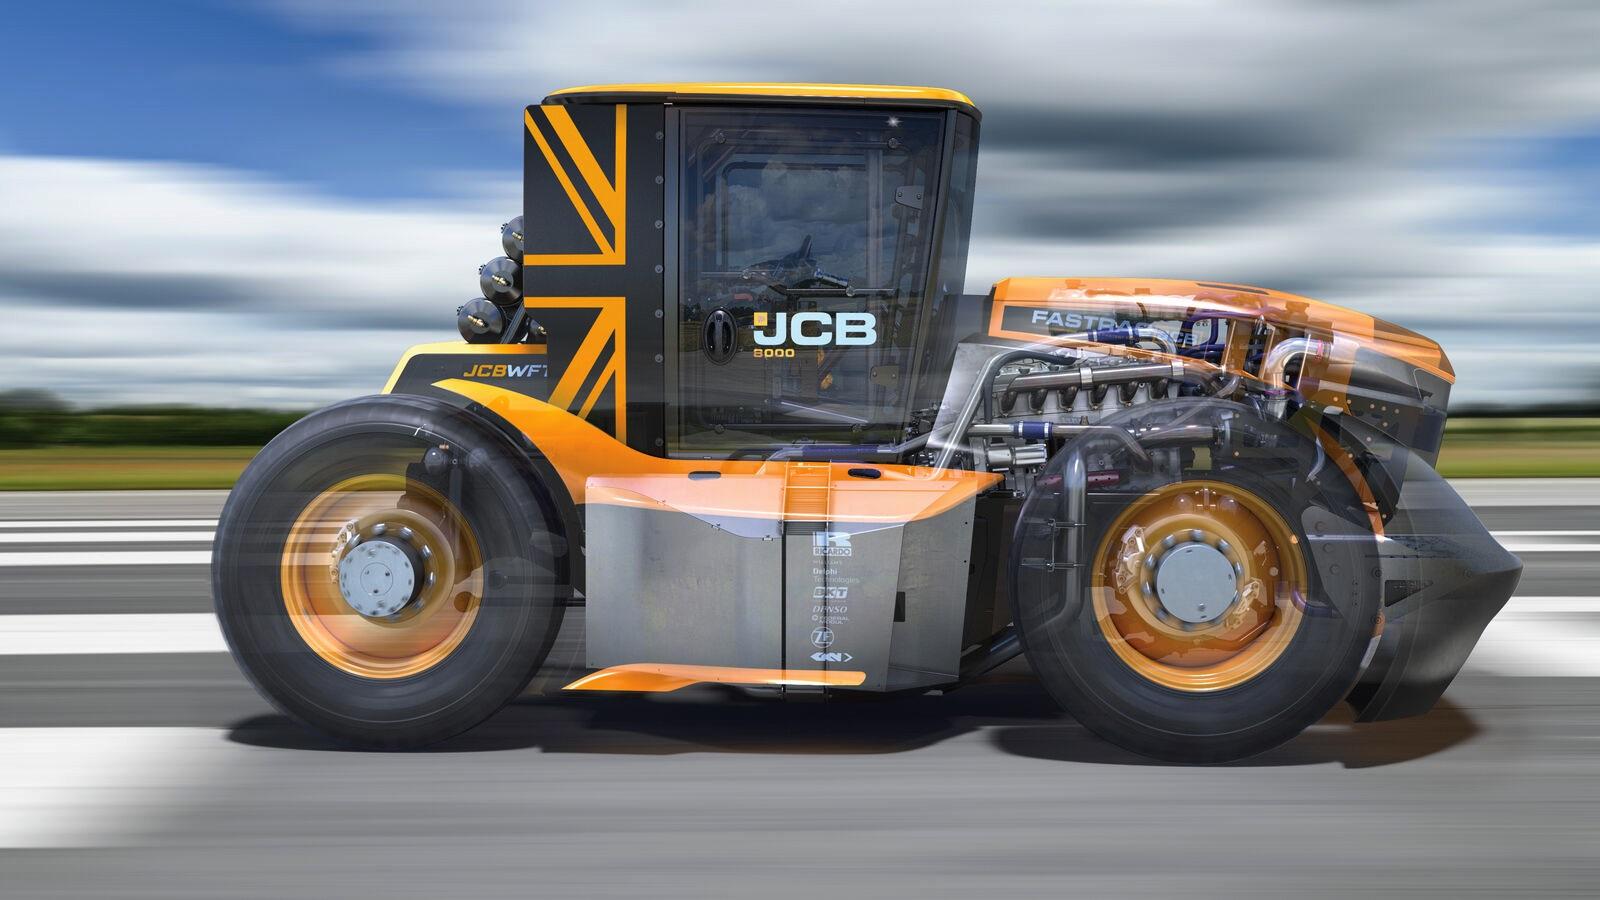 Jcb Fastrac Two (2)